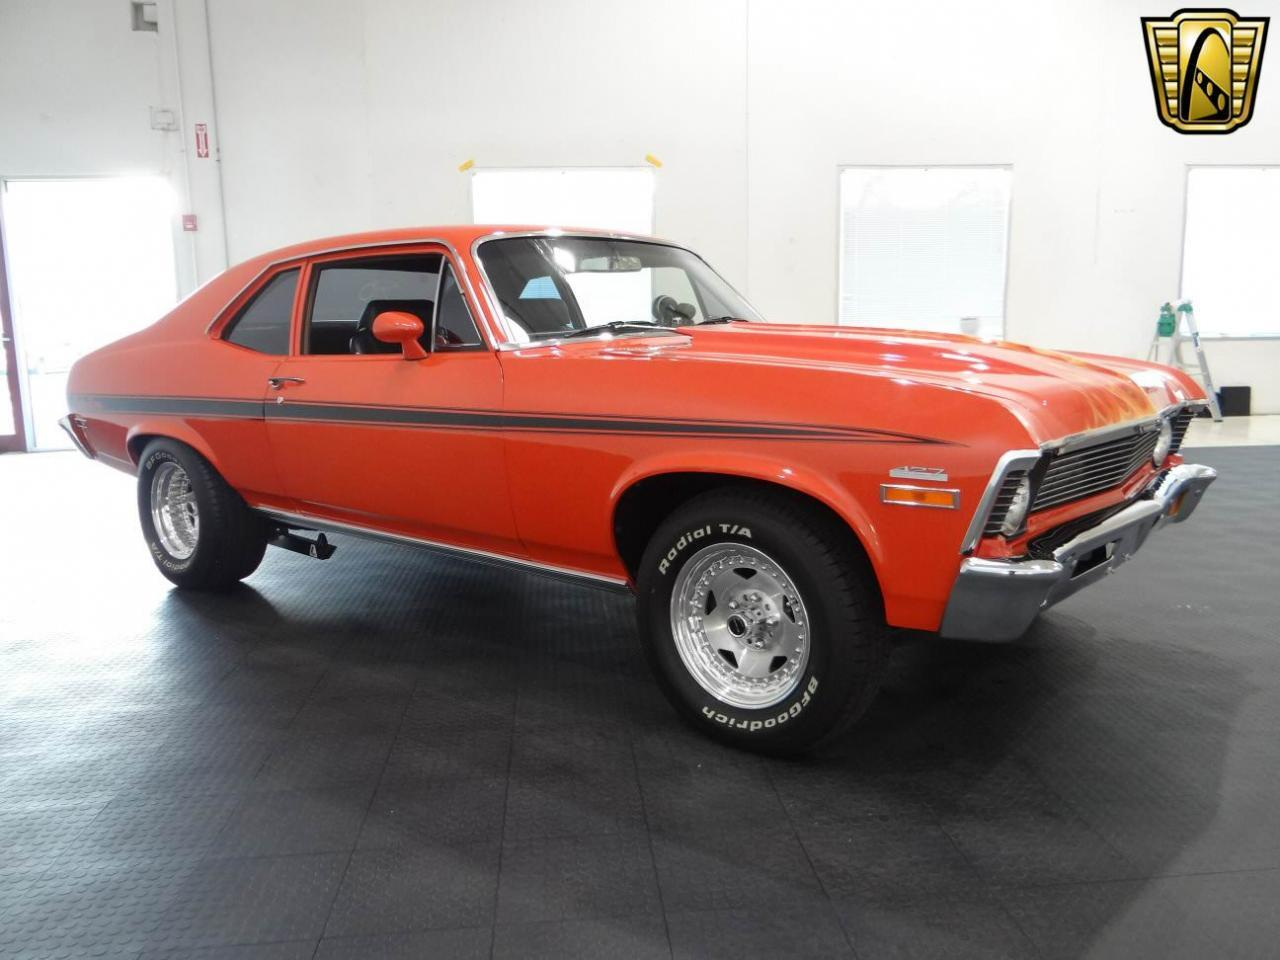 For Sale: 1971 Chevrolet Nova in Tinley Park, Illinois